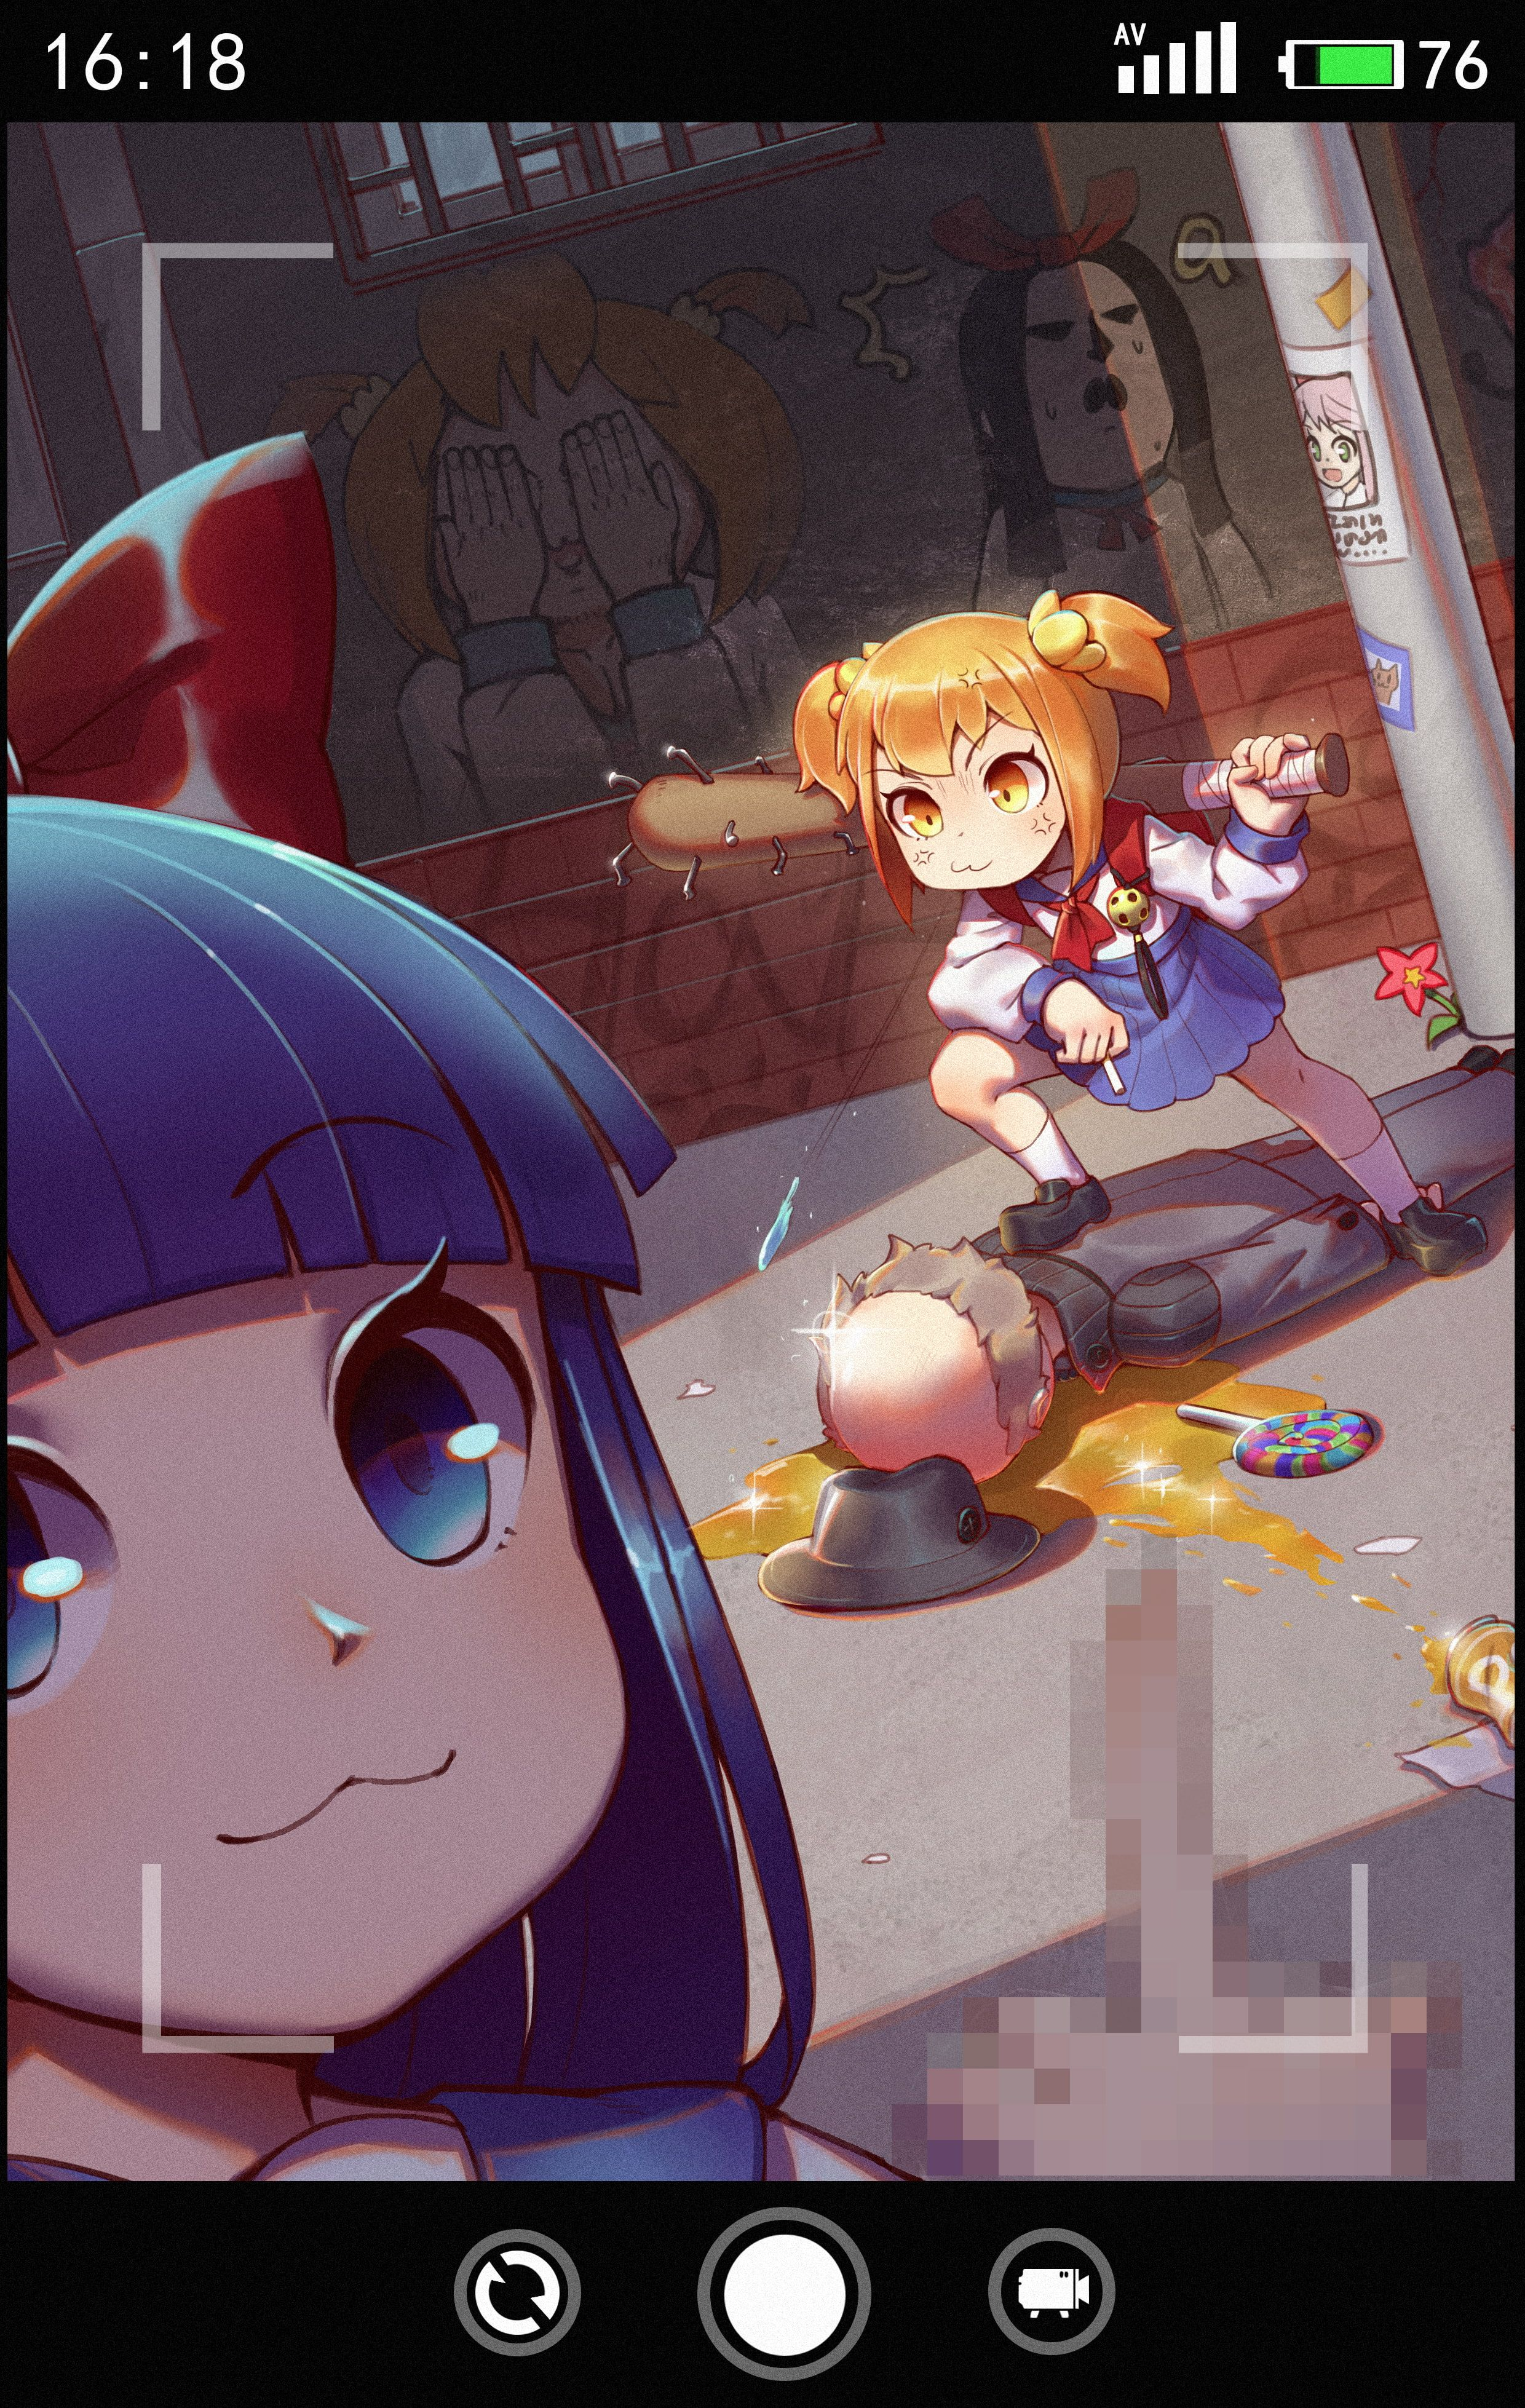 Poputepipikku Pipimi Popuko Anime Girls 4k Wallpaper Hdwallpaper Desktop In 2020 Anime Art Anime Anime Funny